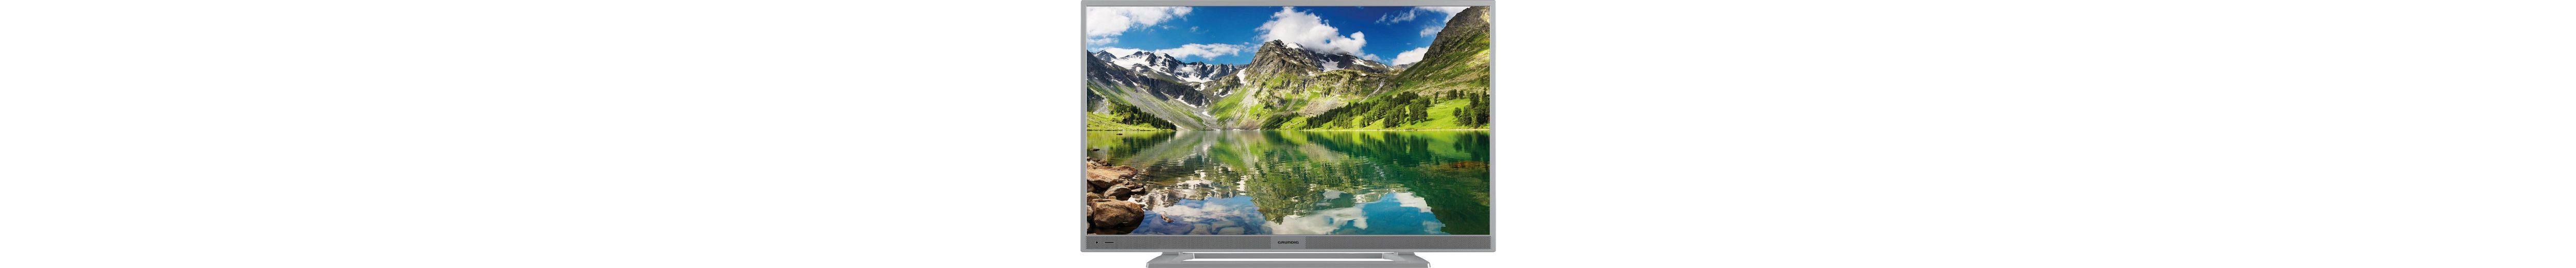 Grundig 22 GFS 5620, LED Fernseher, 55 cm (22 Zoll), 1080p (Full HD)